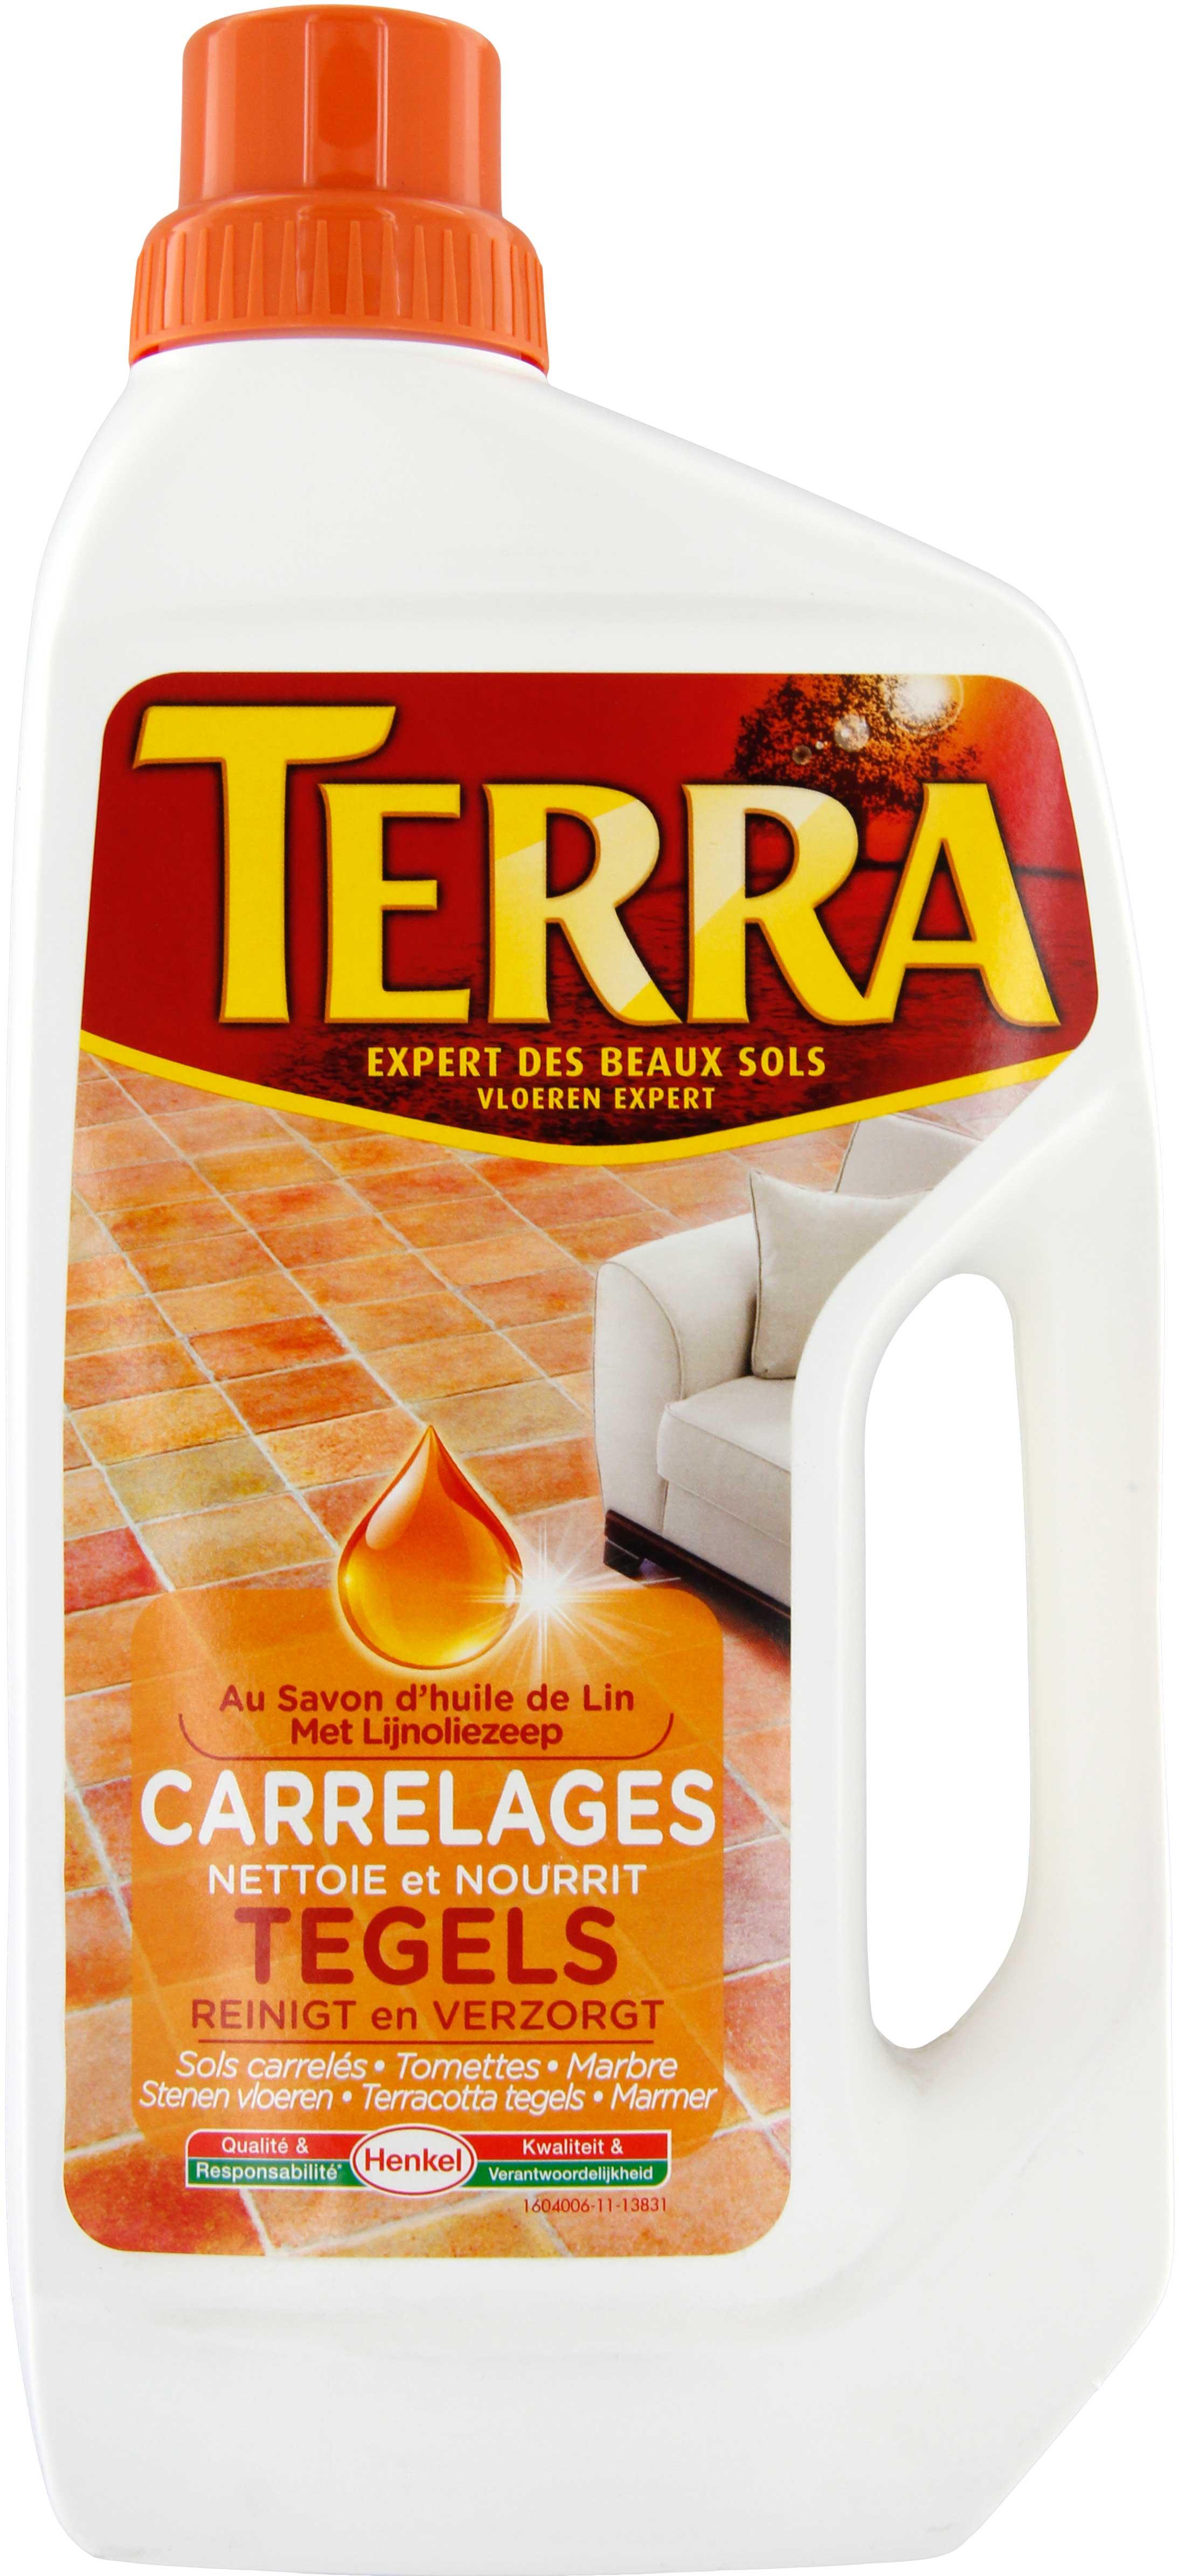 Savon huile de lin terra flacon 1 l achat vente de savon - Huile de lin tomettes ...